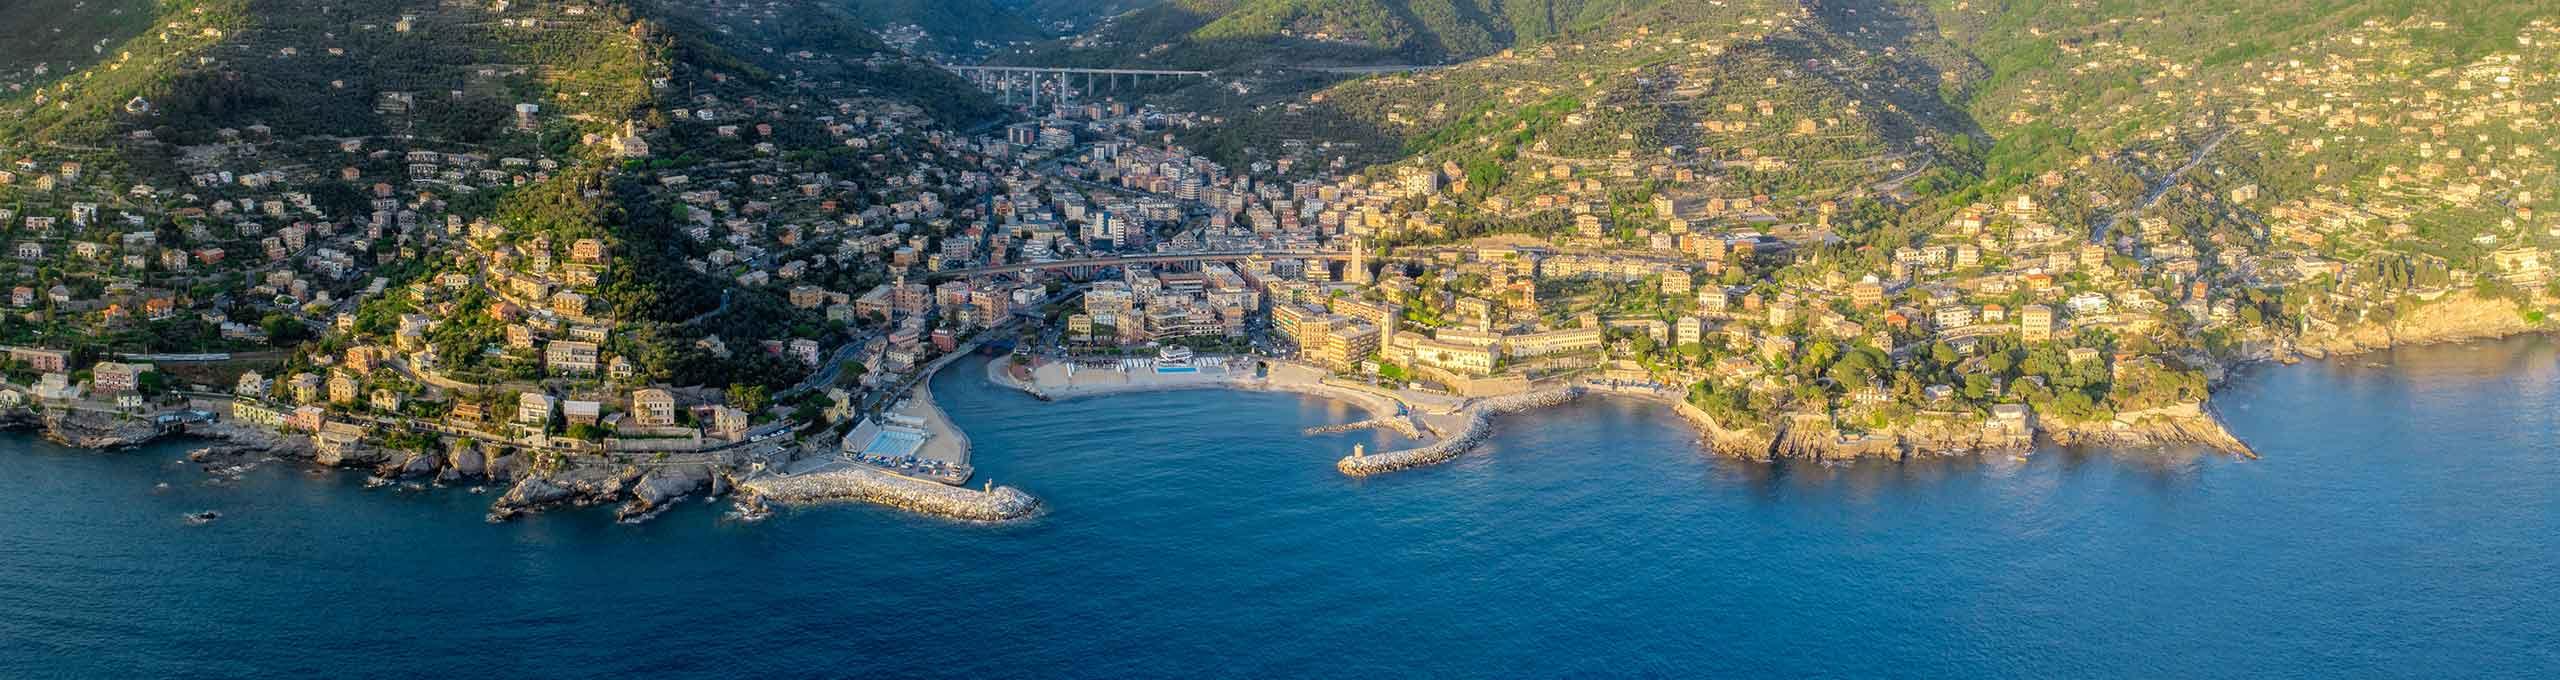 Recco, Golfo Paradiso, Liguria